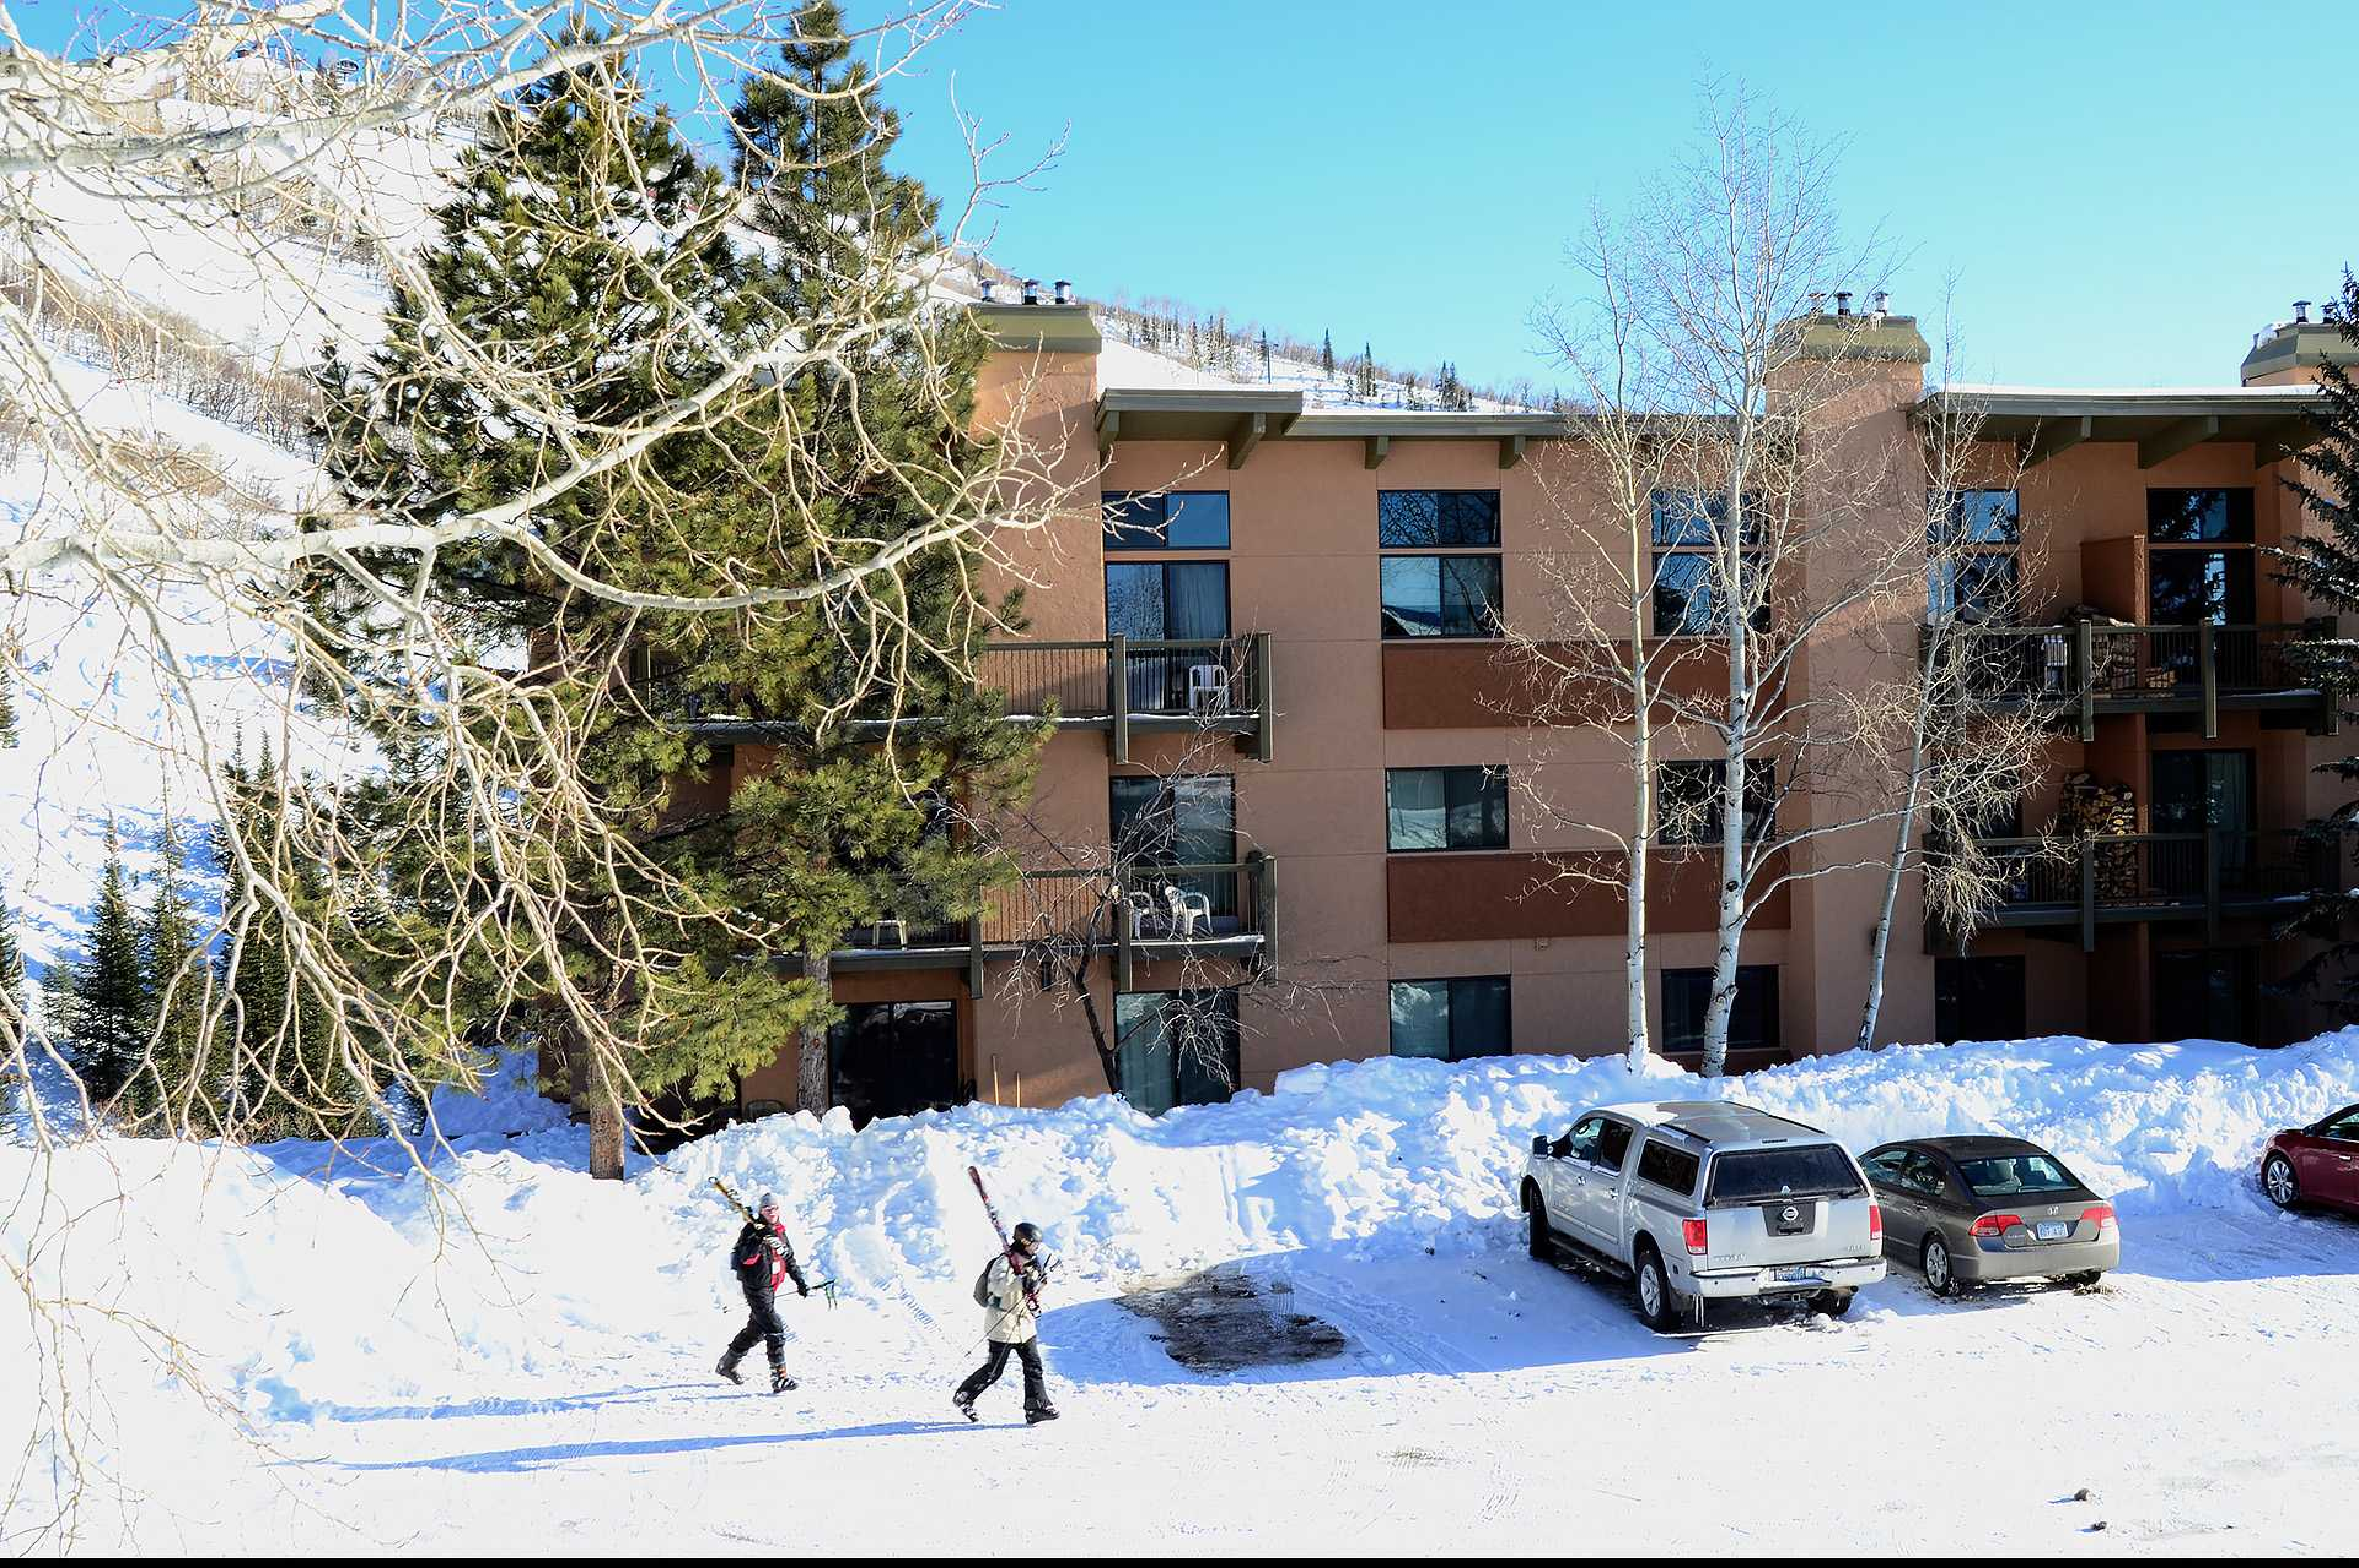 CB315: Storm Meadows Club B Condominiums